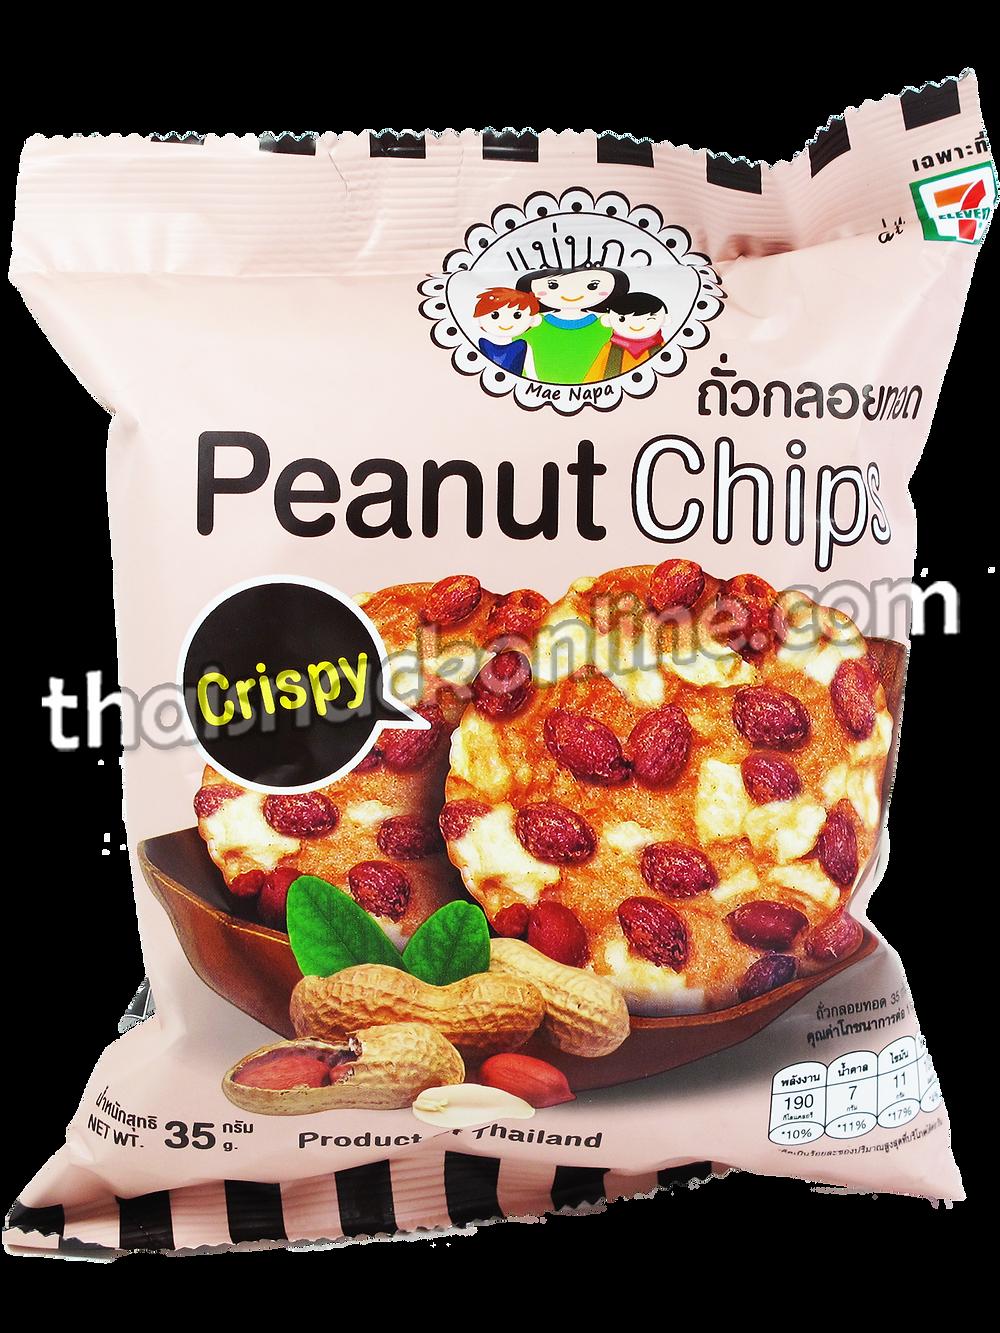 Mae Napa - Peanut Chips